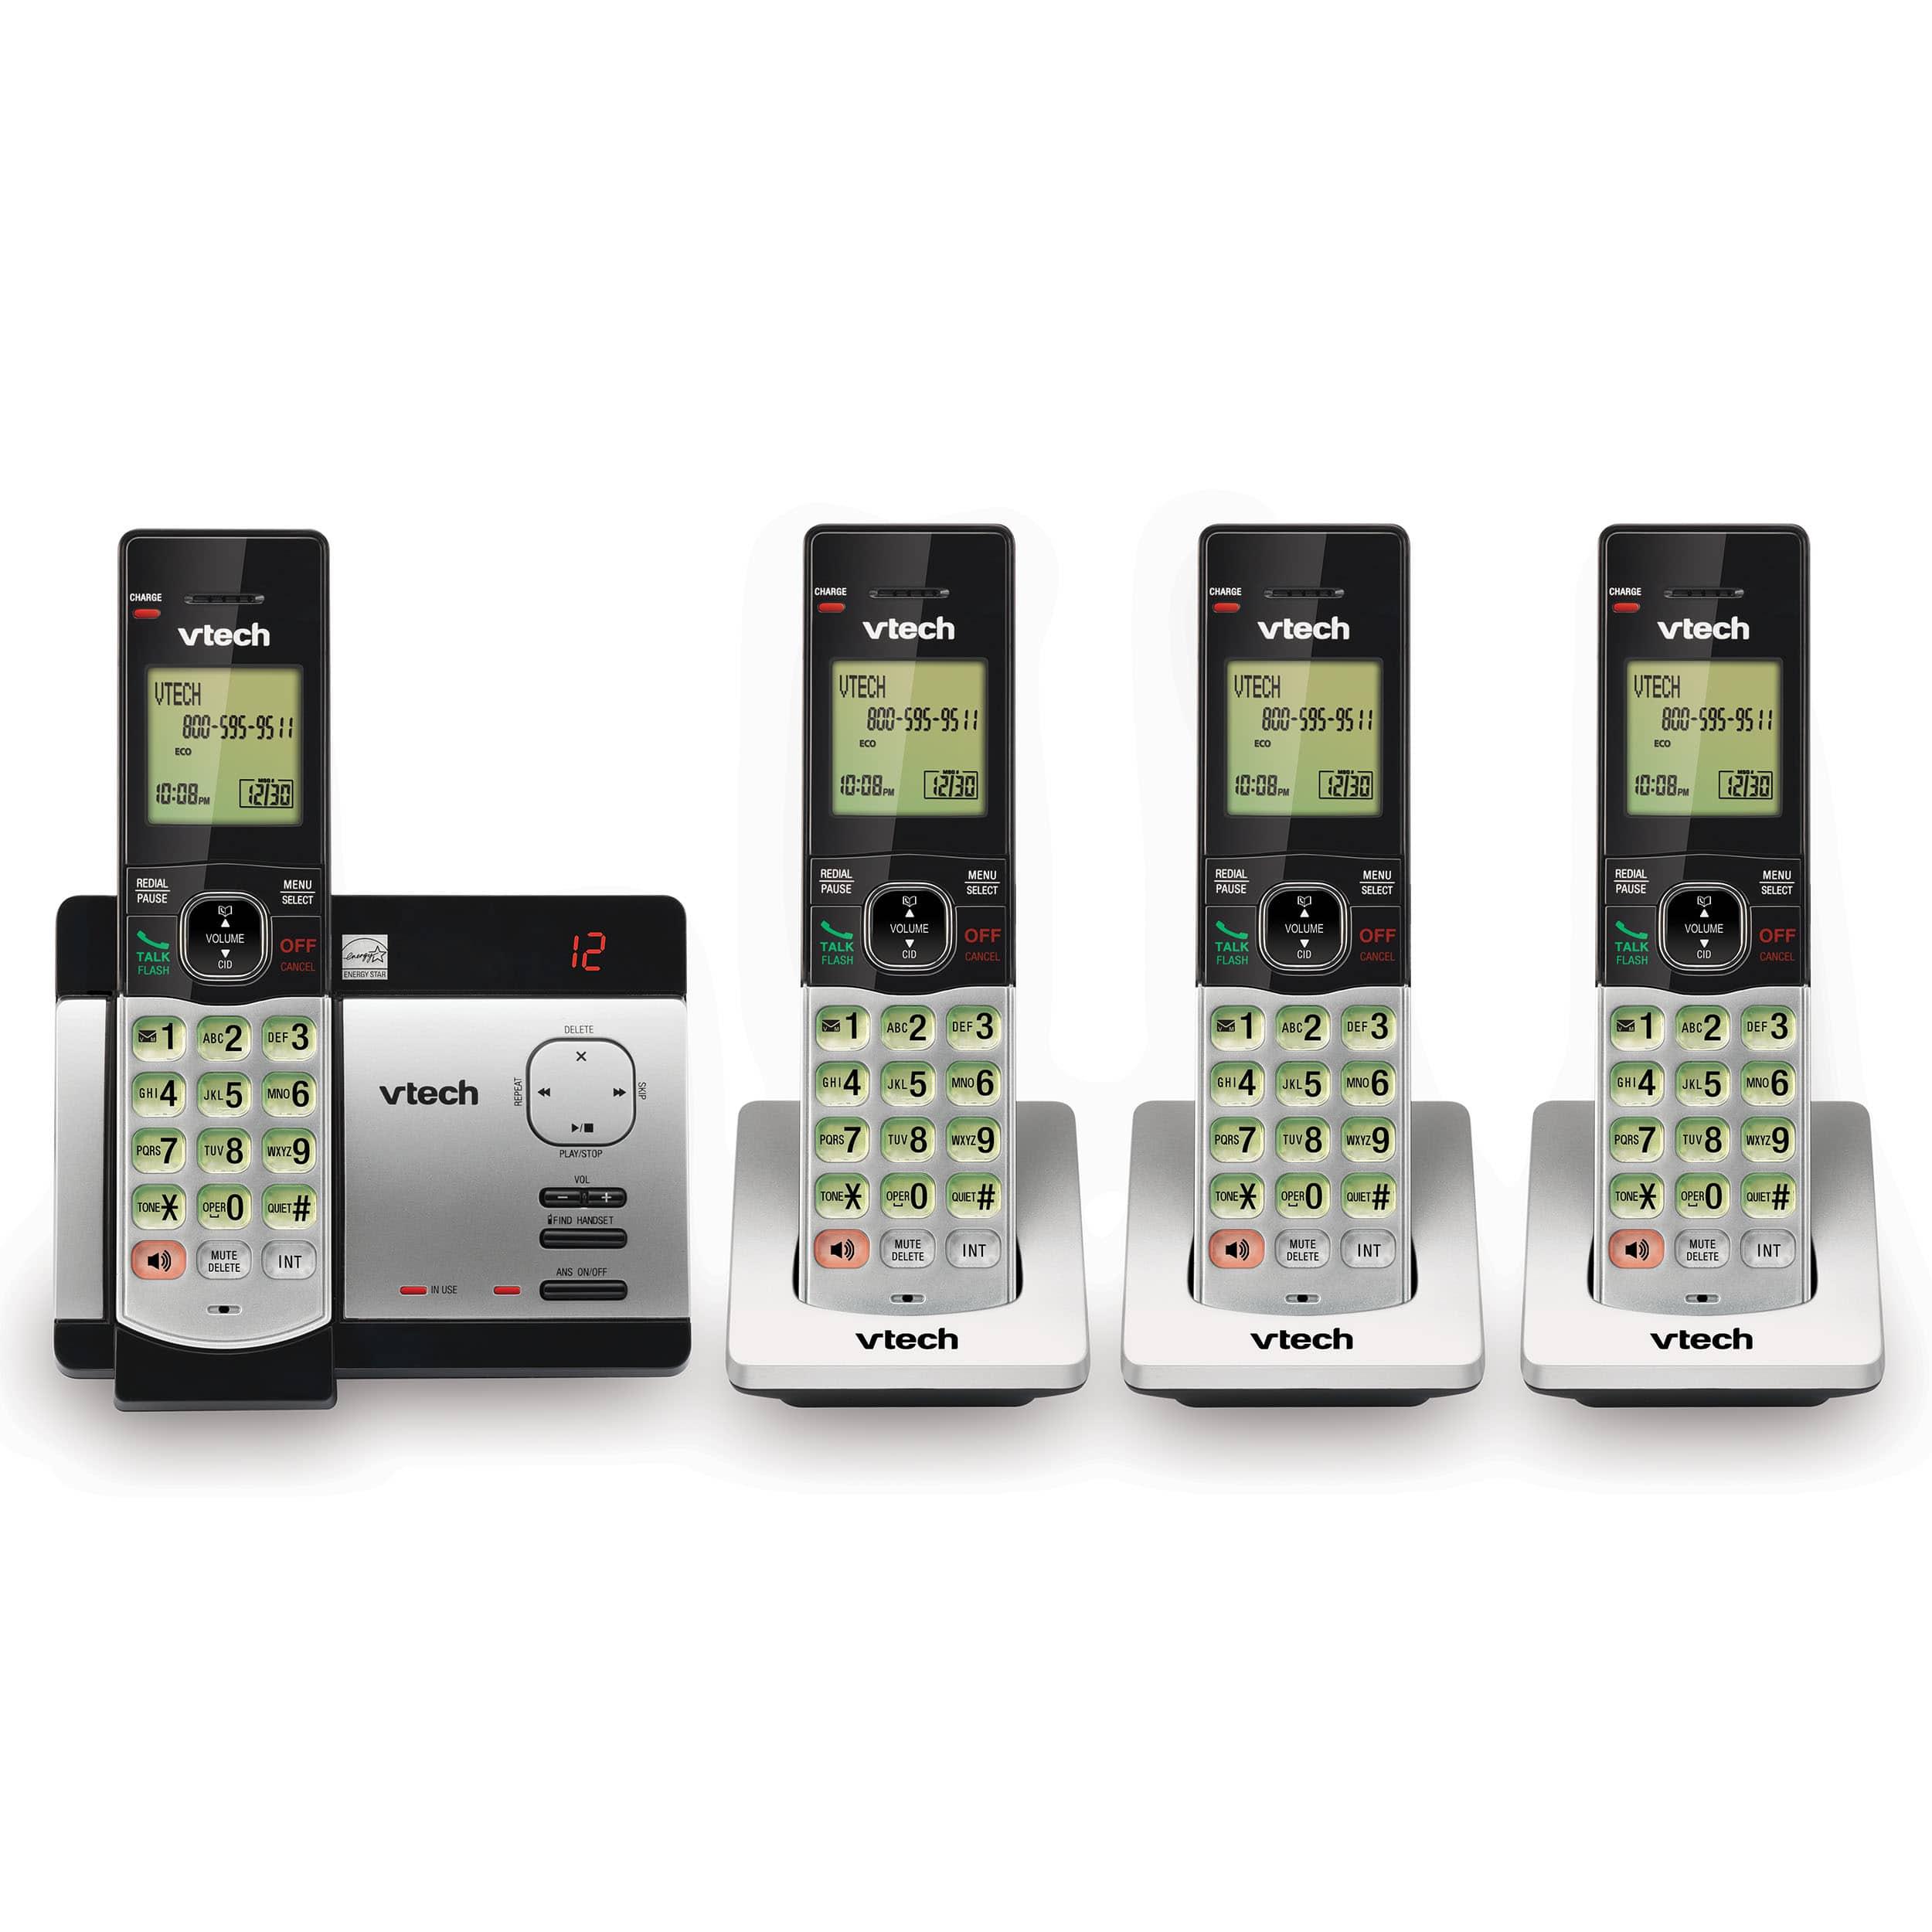 4 handset cordless phone with digital answering system caller id rh vtechphones com vtech model cs6529-3 manual vtech cs6529-3 manual